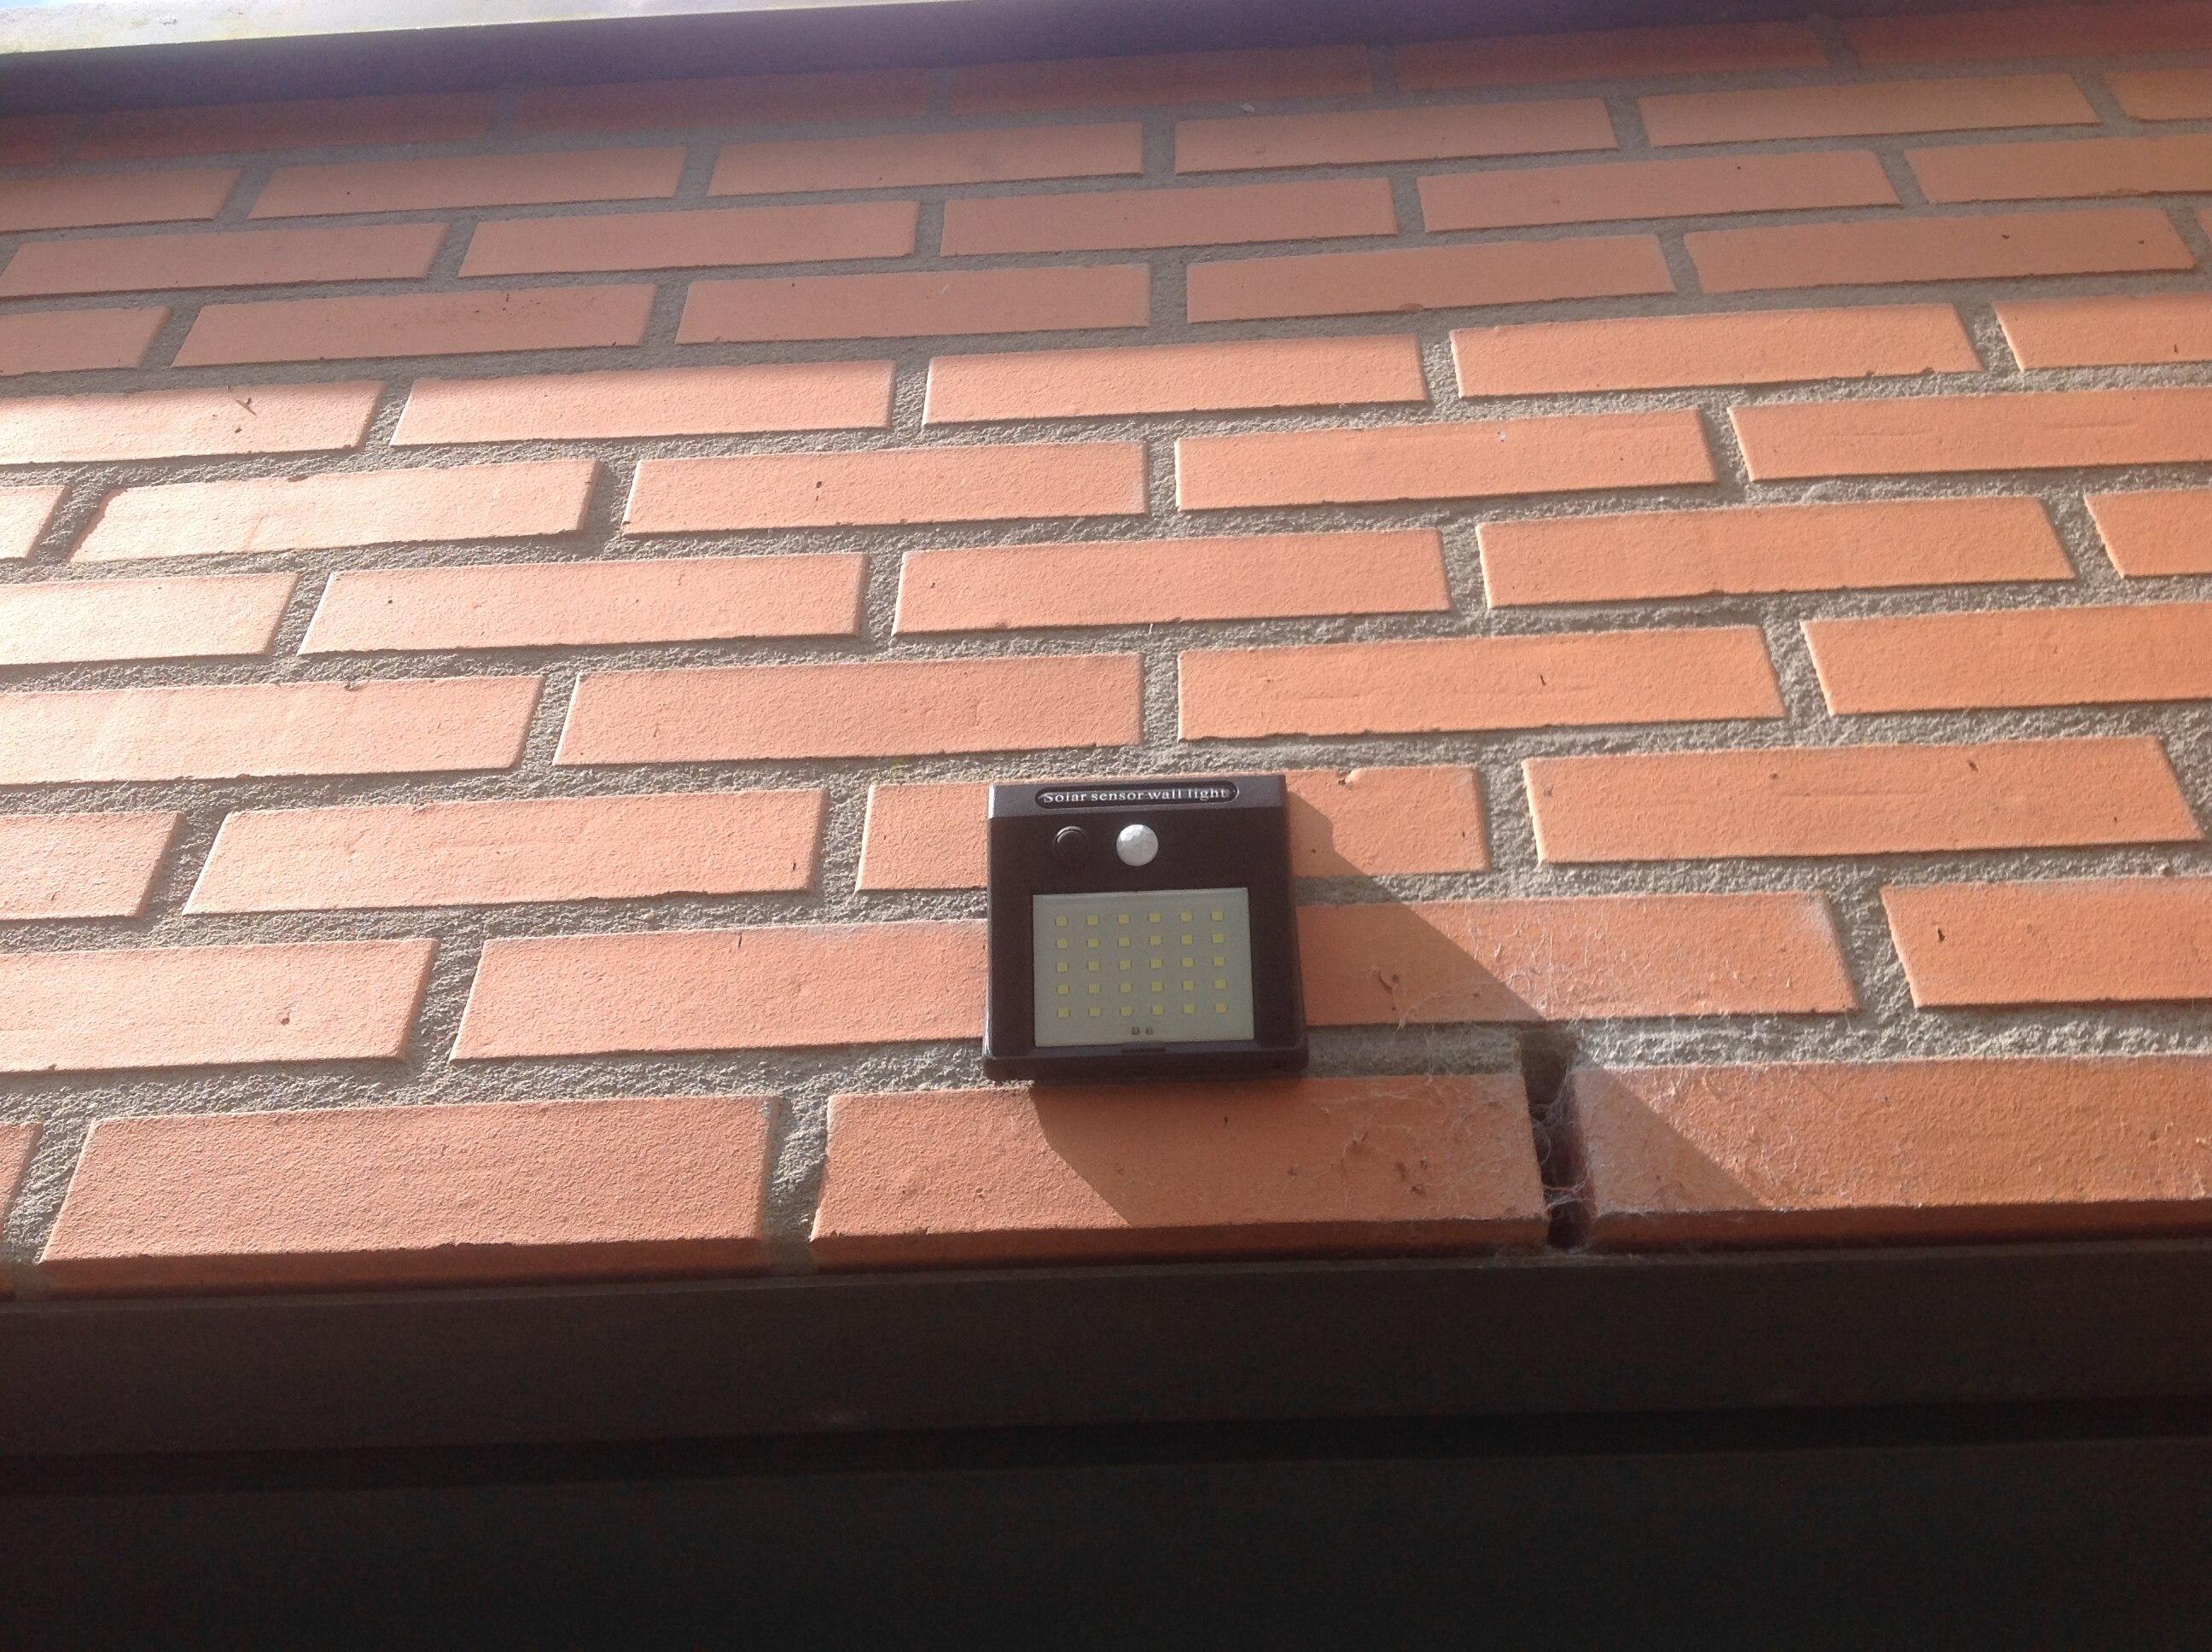 1-4pcs PIR Motion Sensor 30 LED Solar Light Outdoor Solar Powered LED Garden Light Waterproof Emergency Wall Lamp With Cable ene